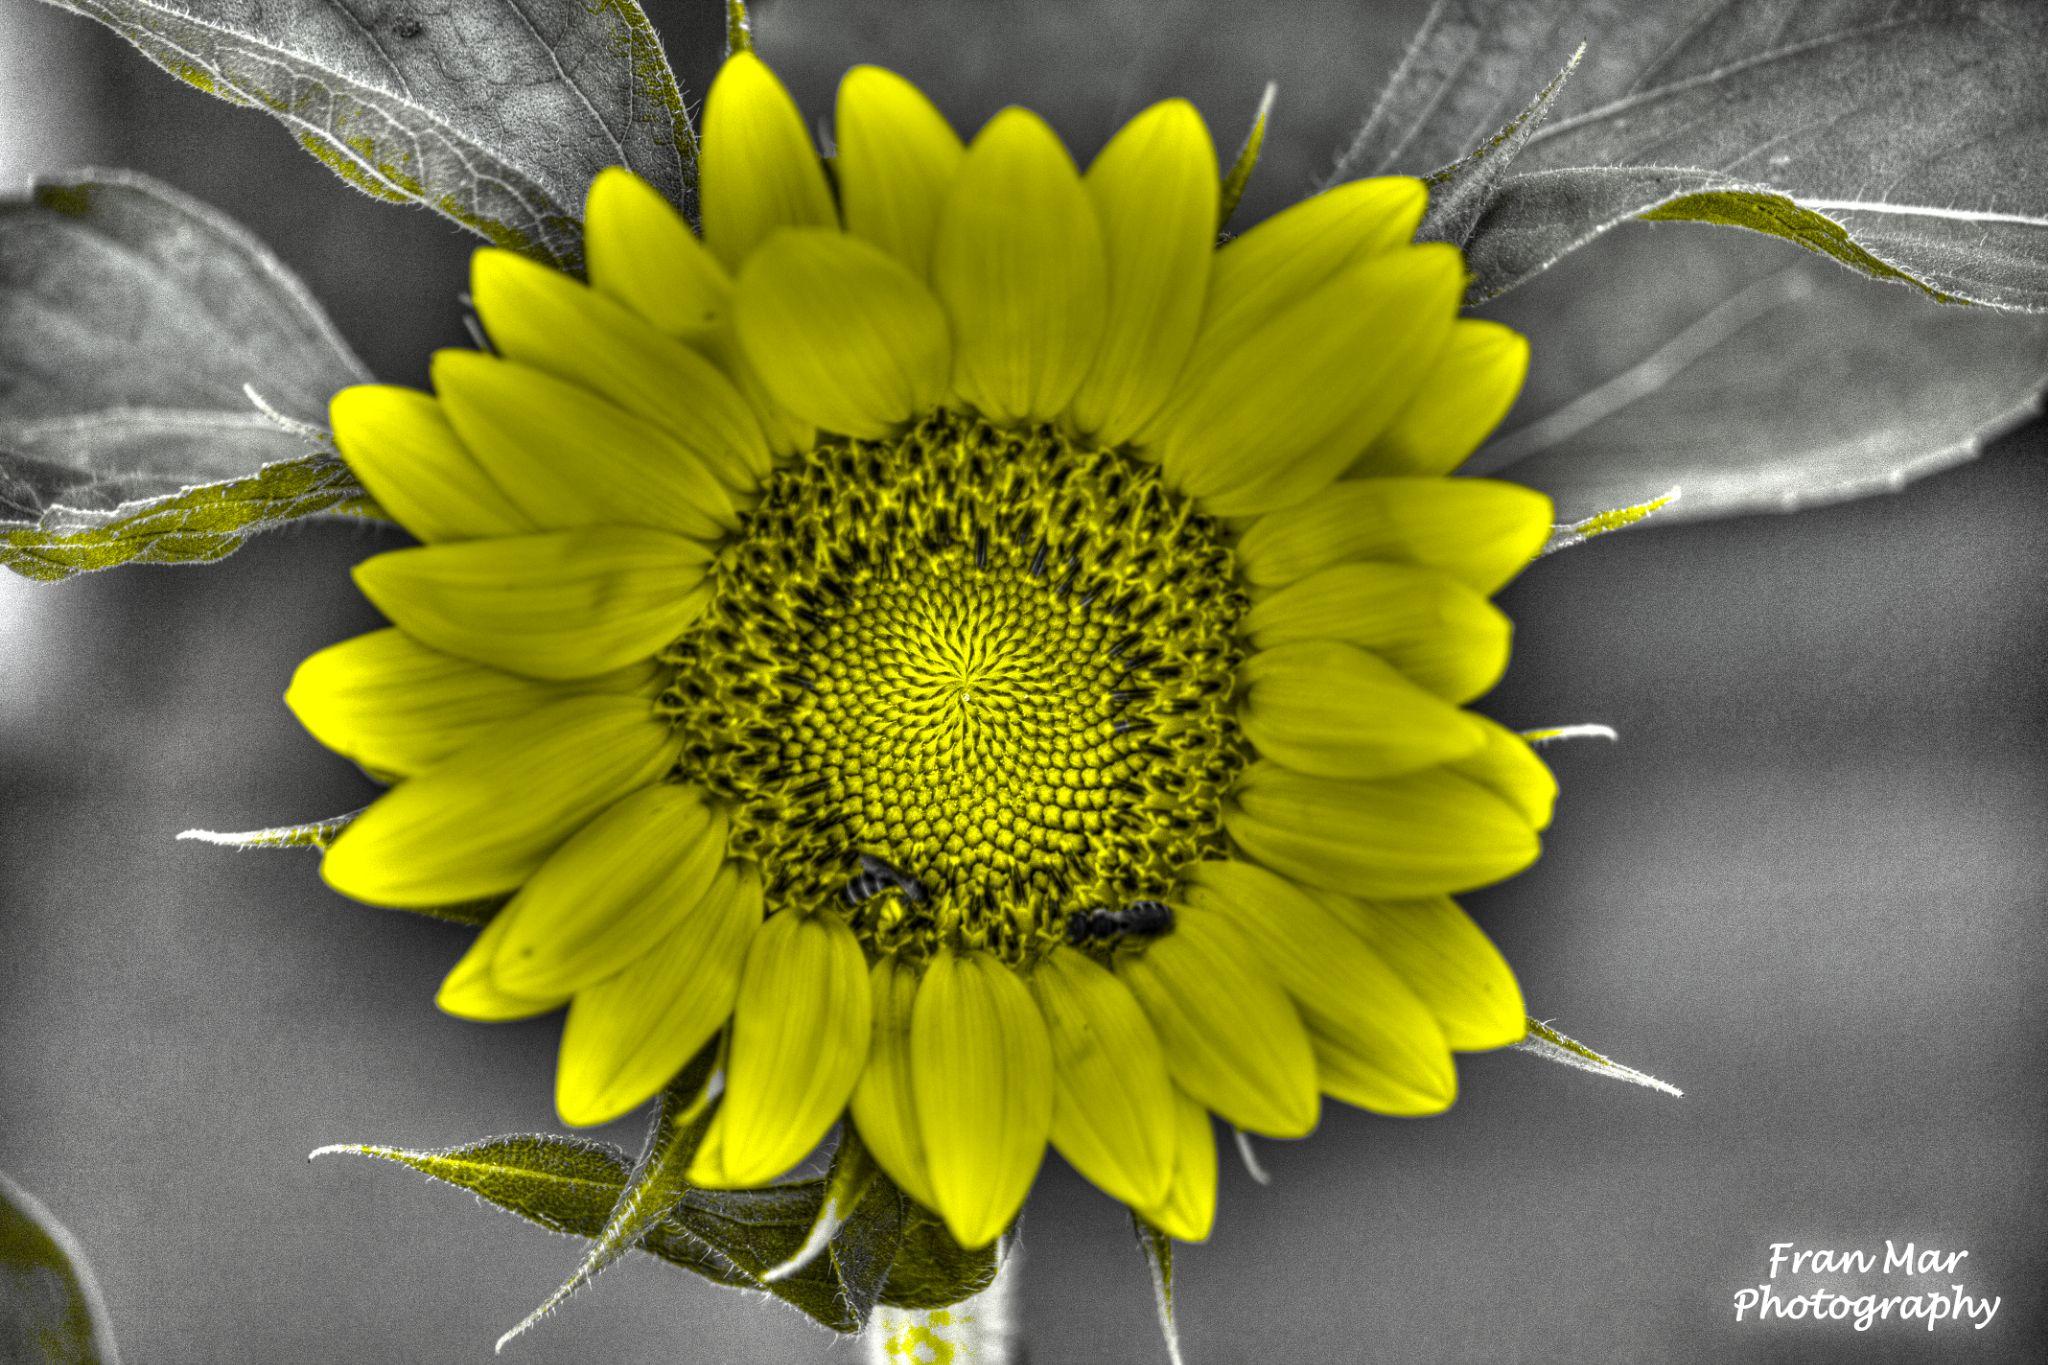 Sunflower by Meg Francoeur